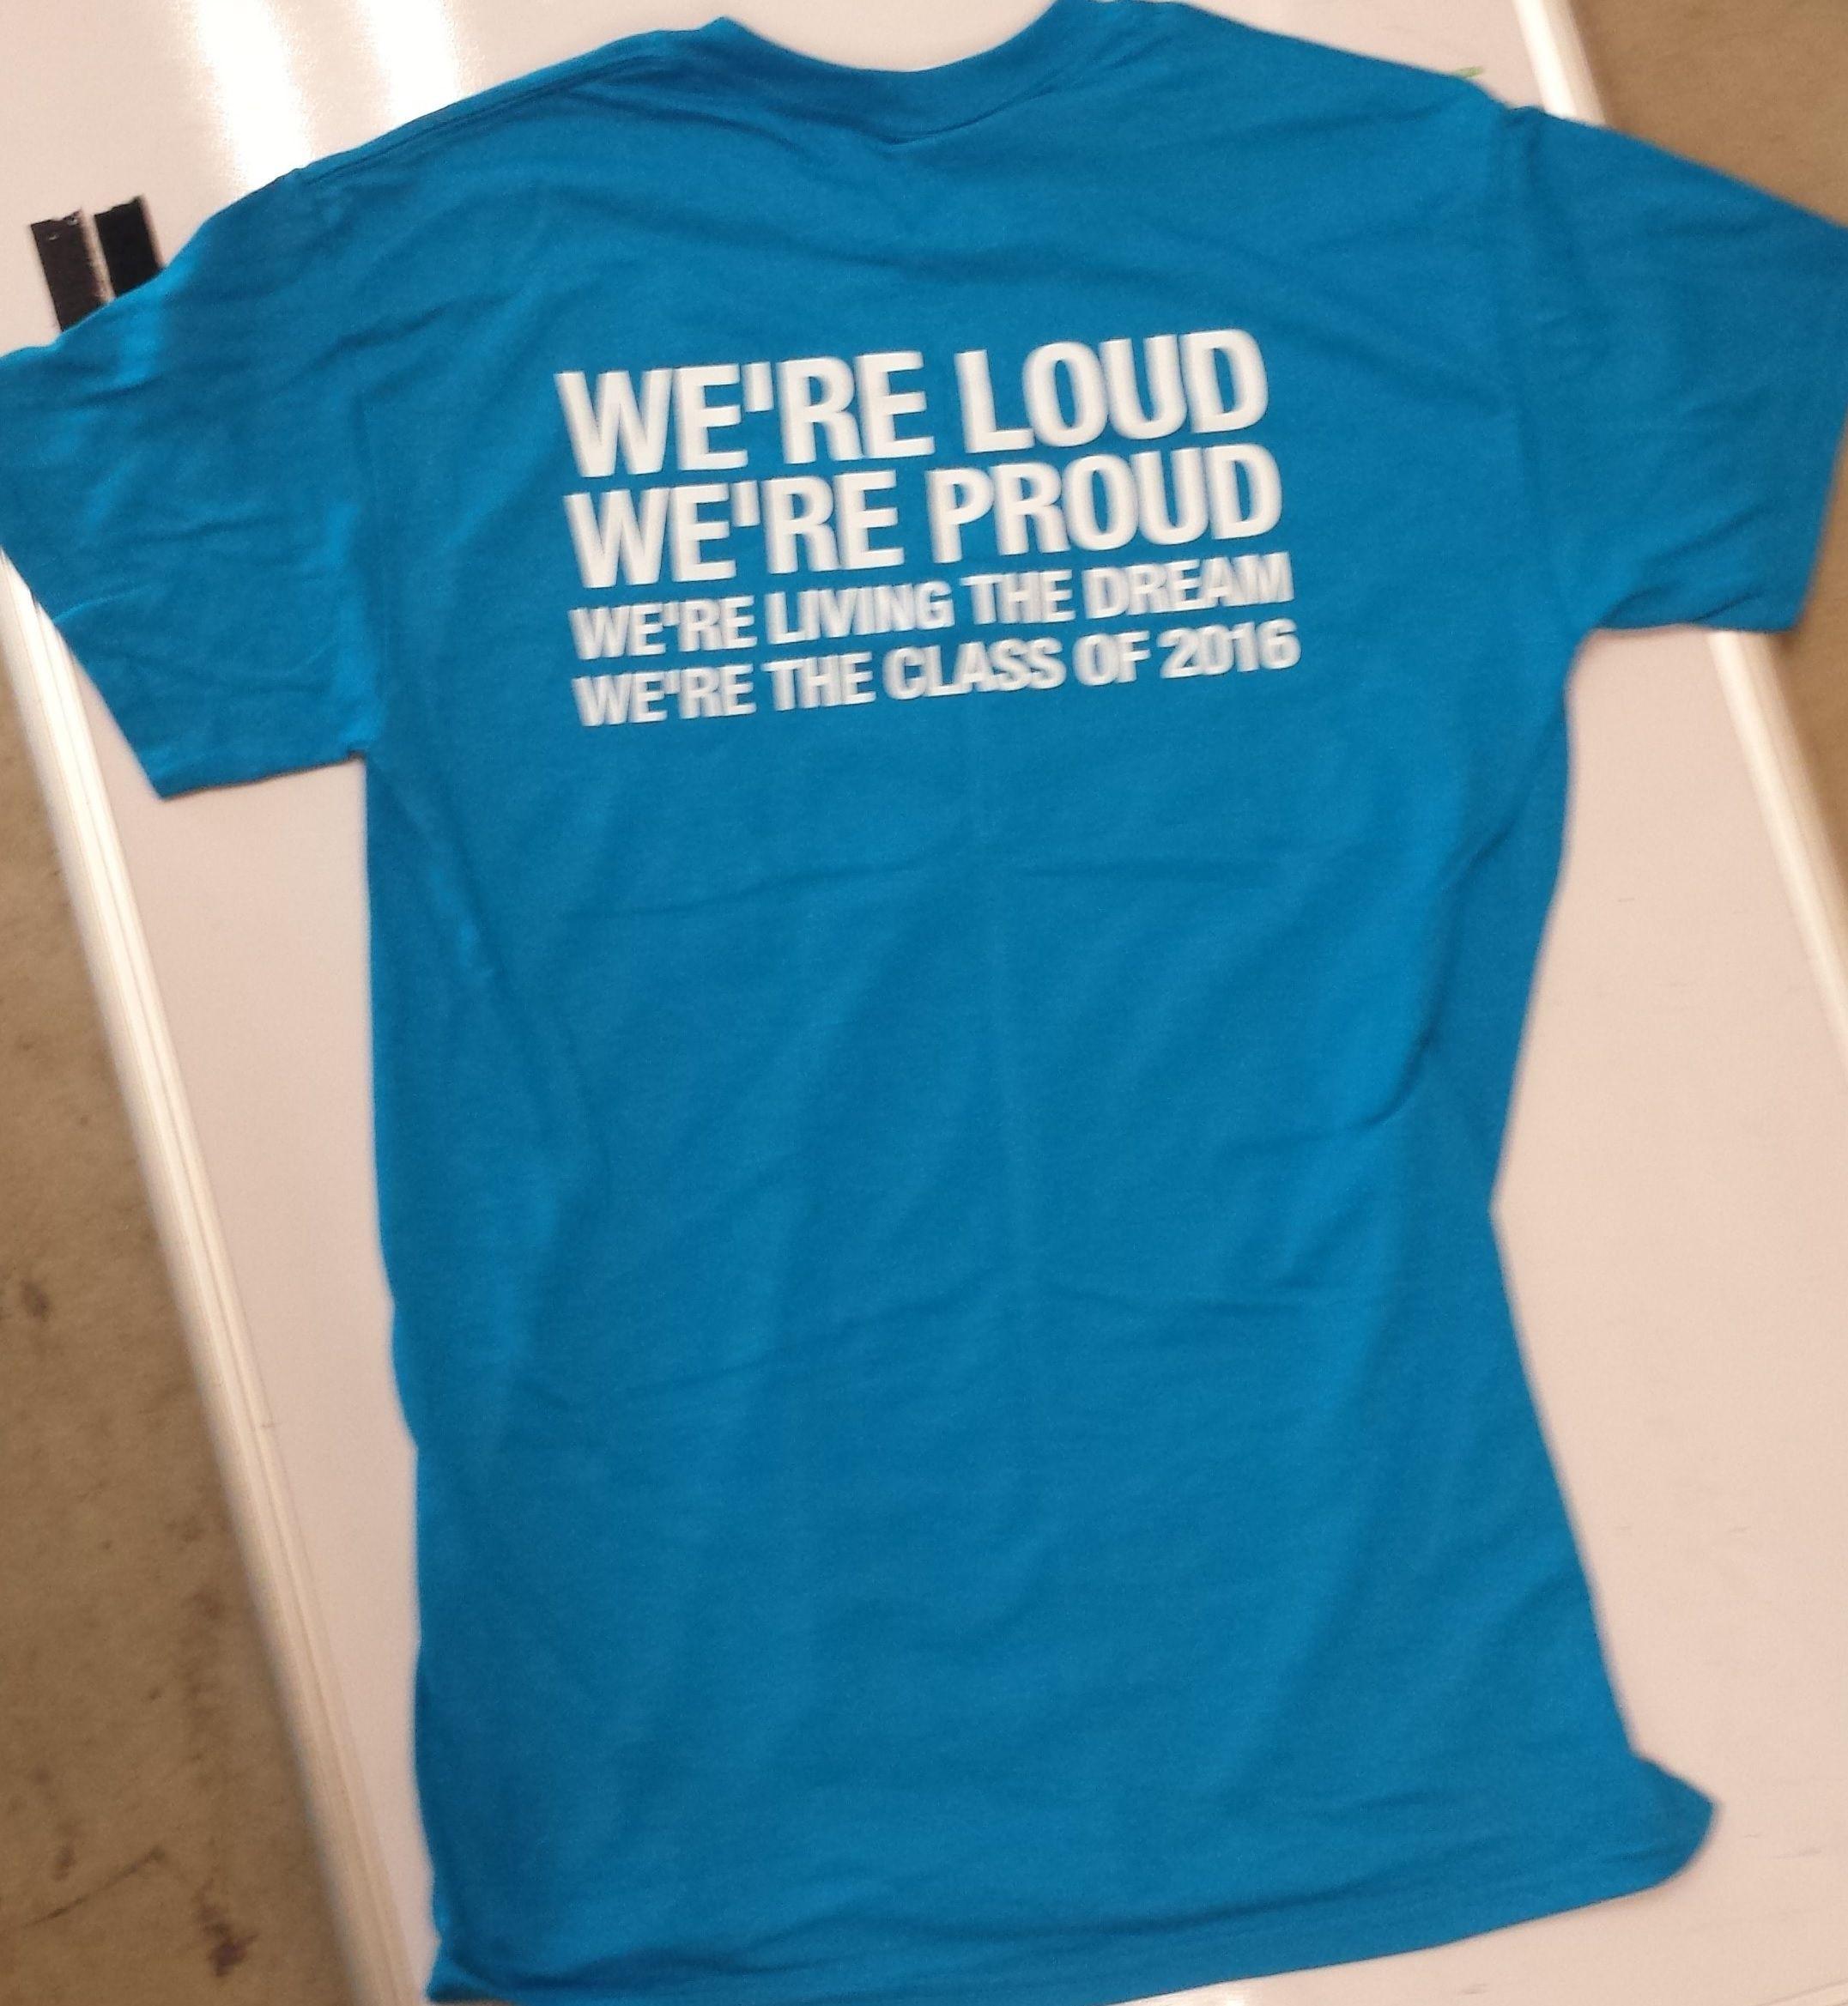 Graduation Shirt Quotes  class of 2016 shirt sayings Google Search